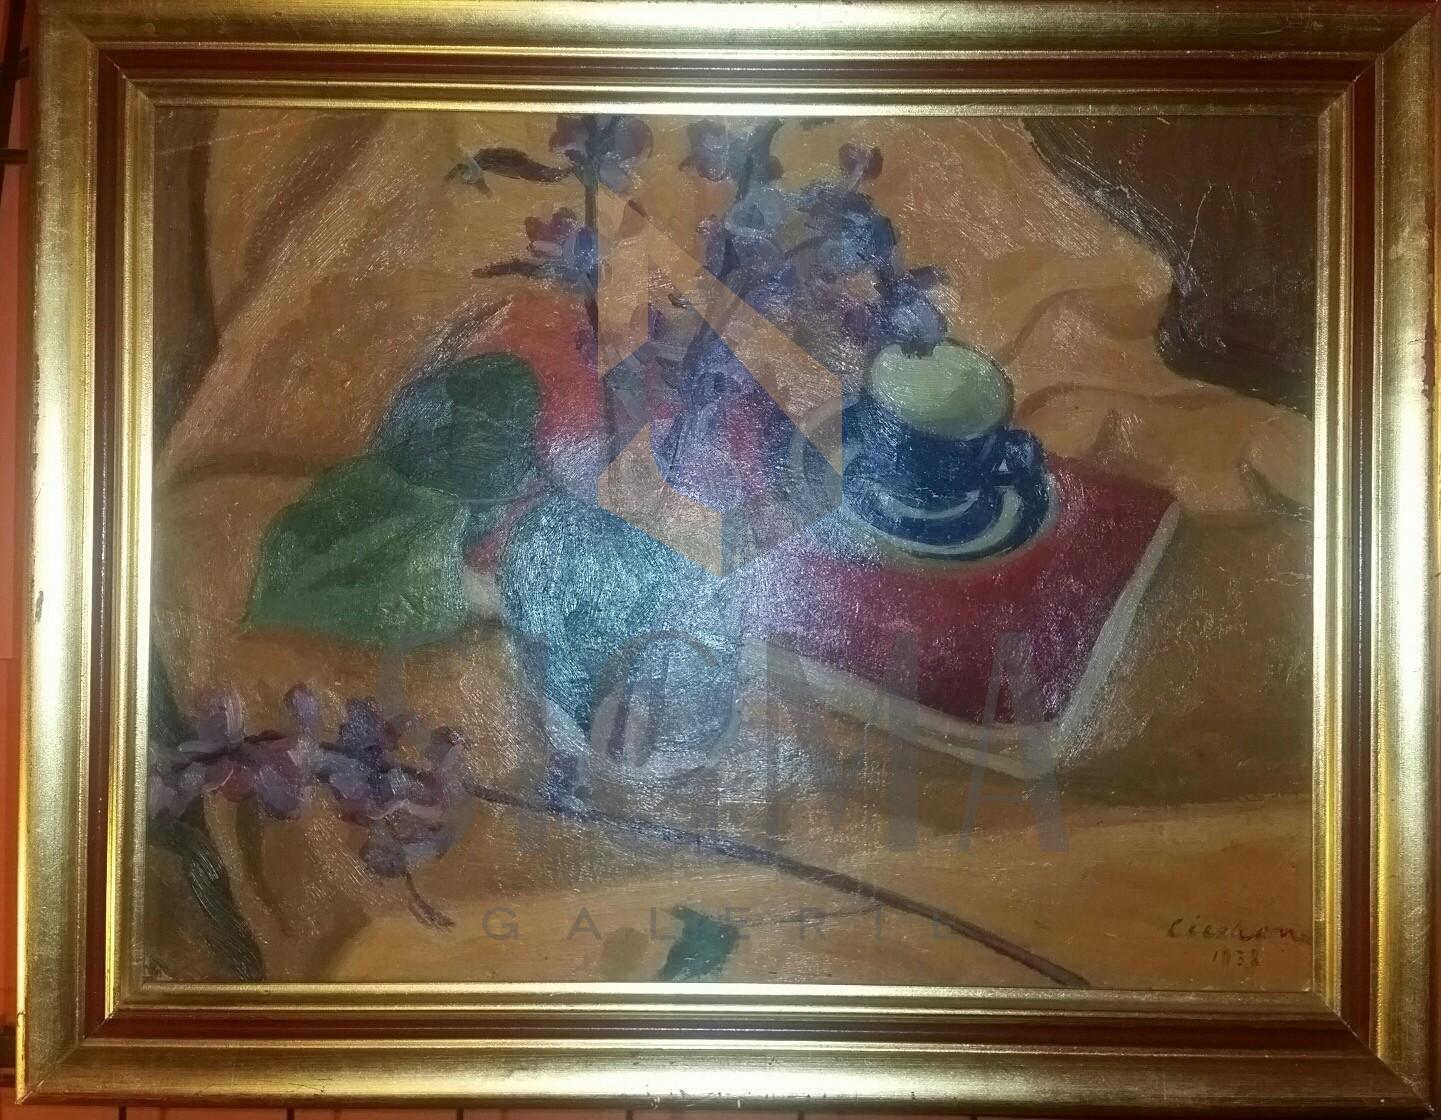 CICERONE Popescu (1908-1998)